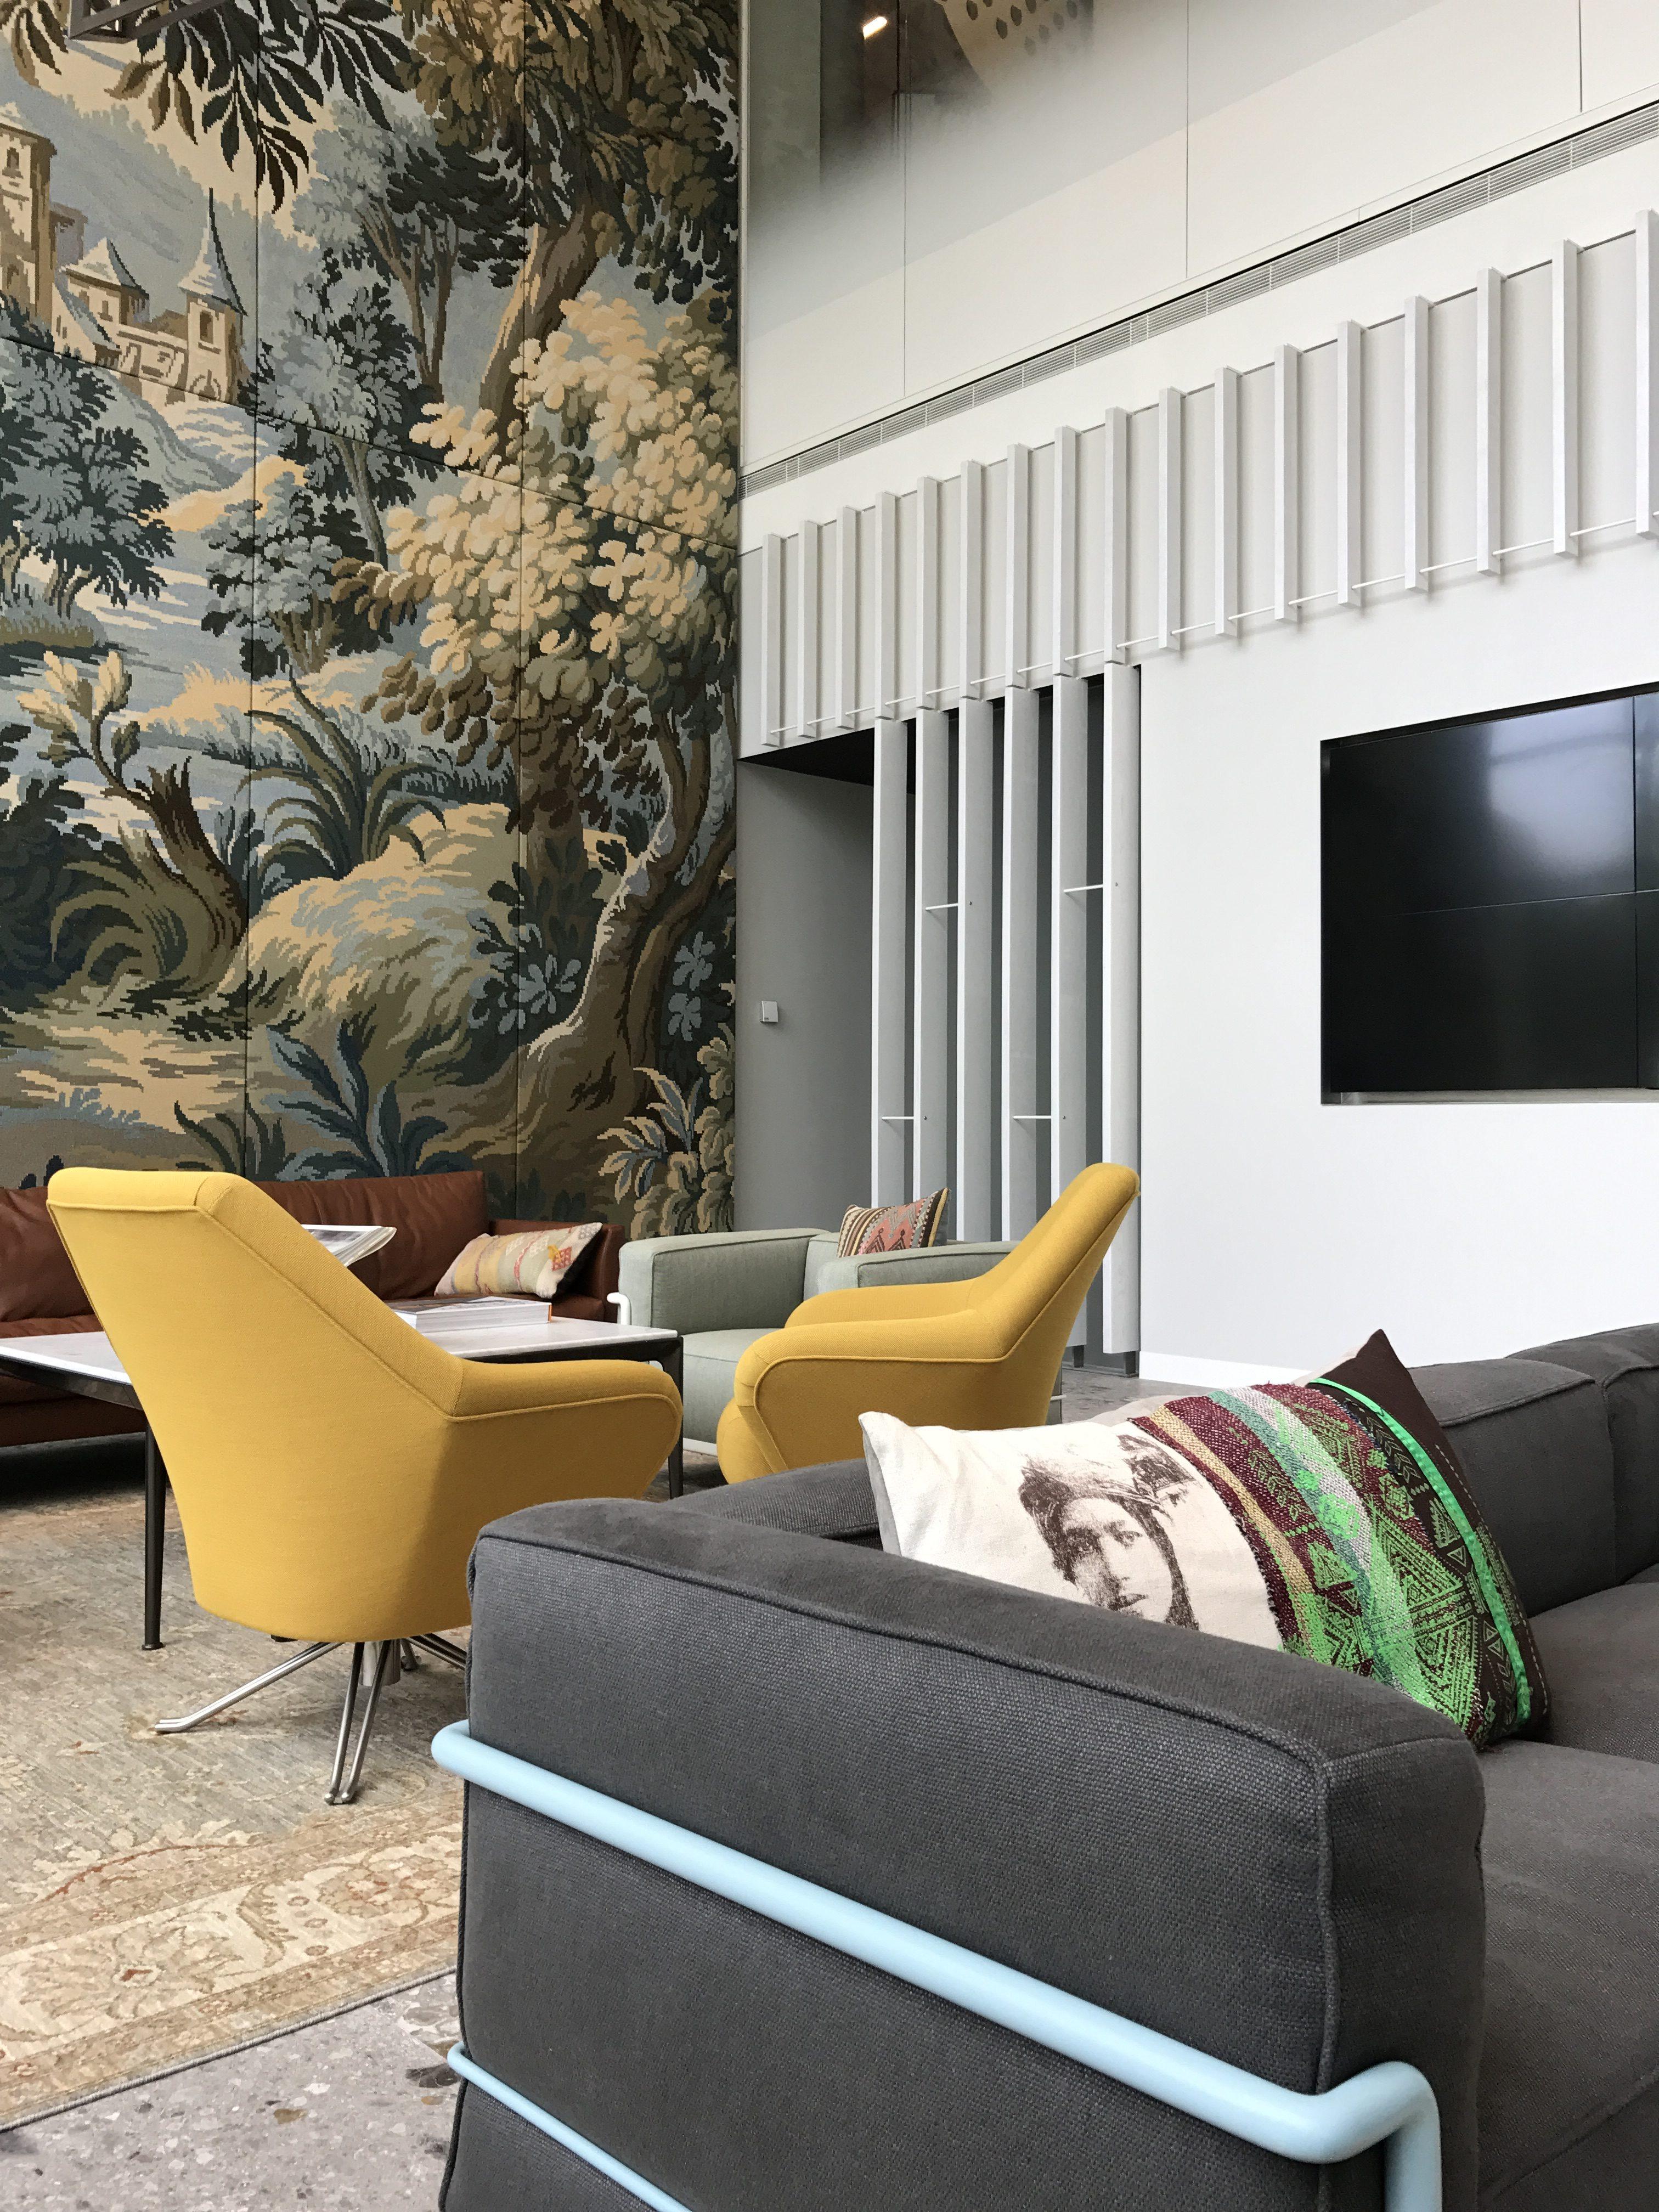 <p>ITO &#8211; Details lounge. Gemoderniseerde gewoven verdure, in kleur gespoten frames, styling. &#8211; Graziosi Progetti </p>